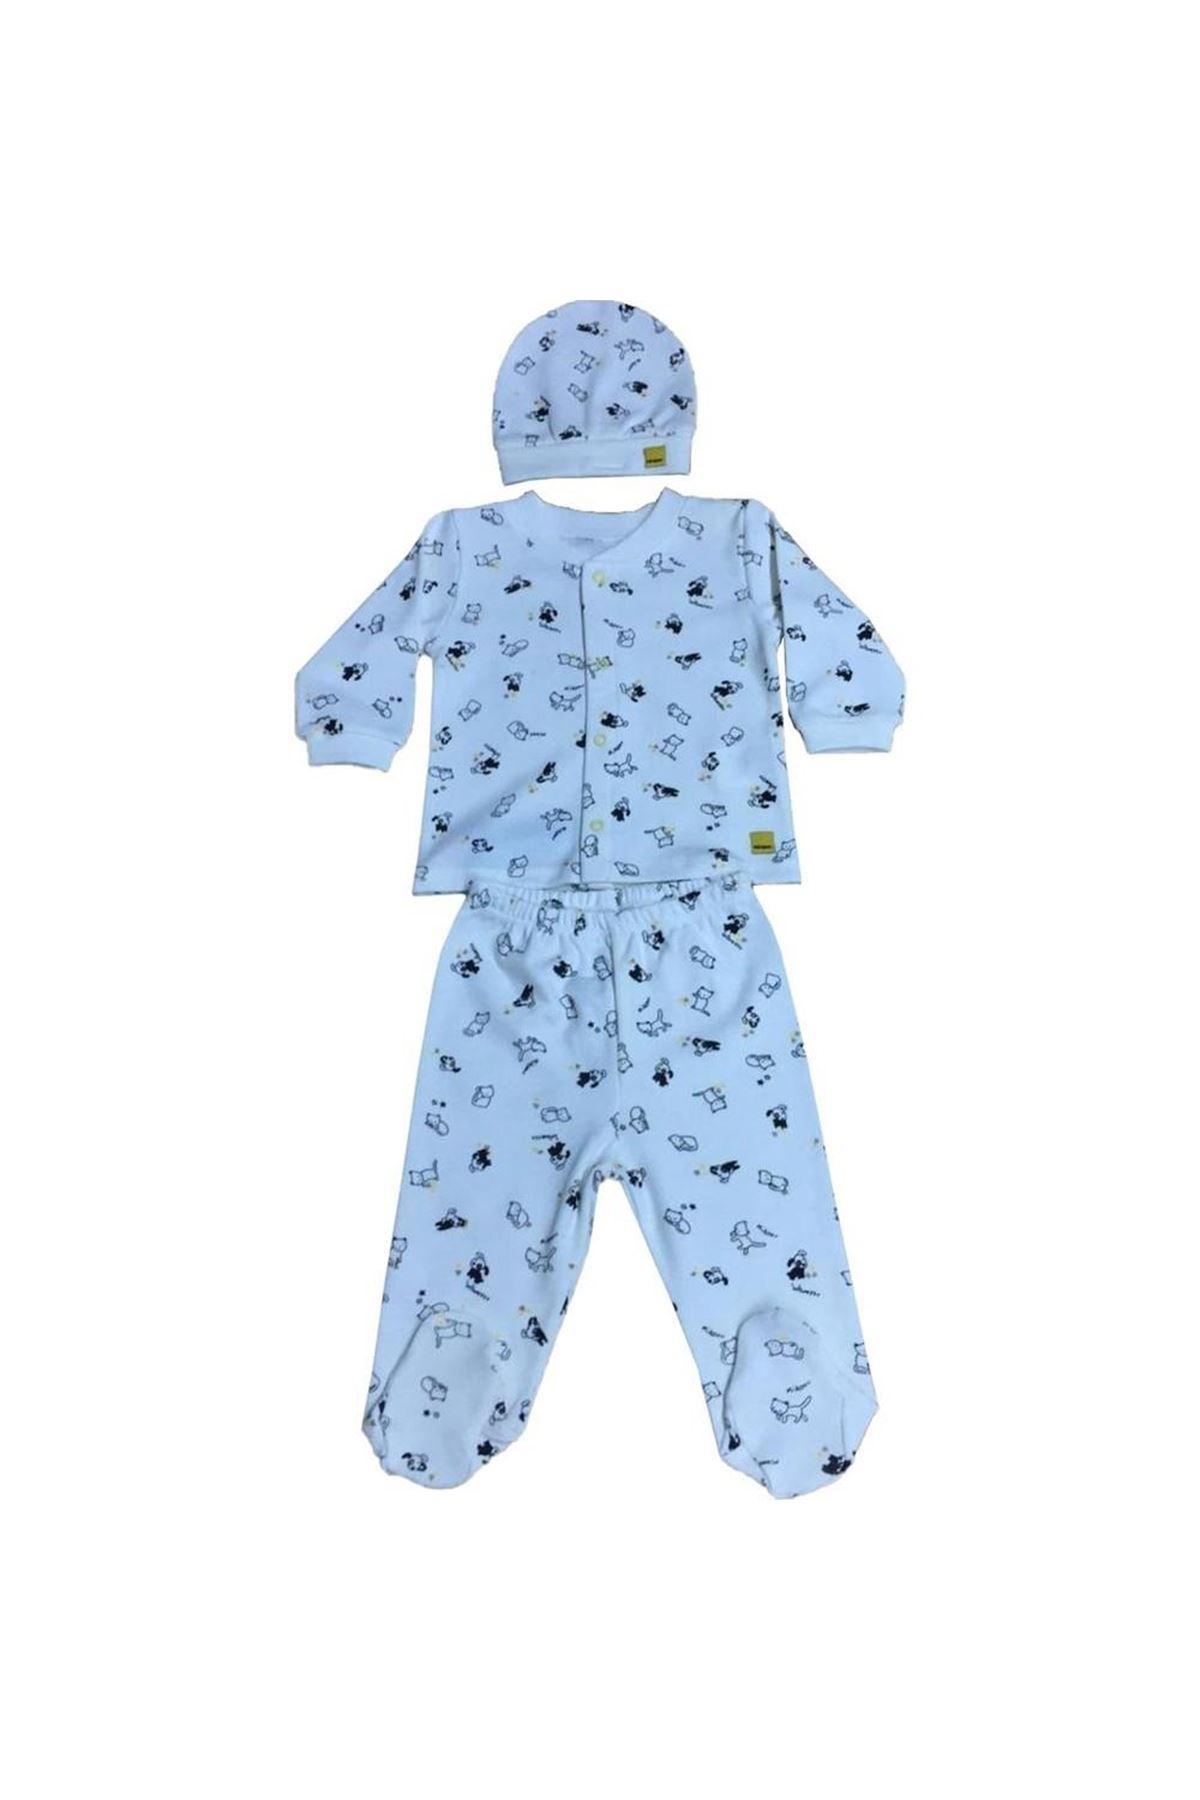 Bebepan Pets Bebek Pijama Takımı 2059 Orjinal